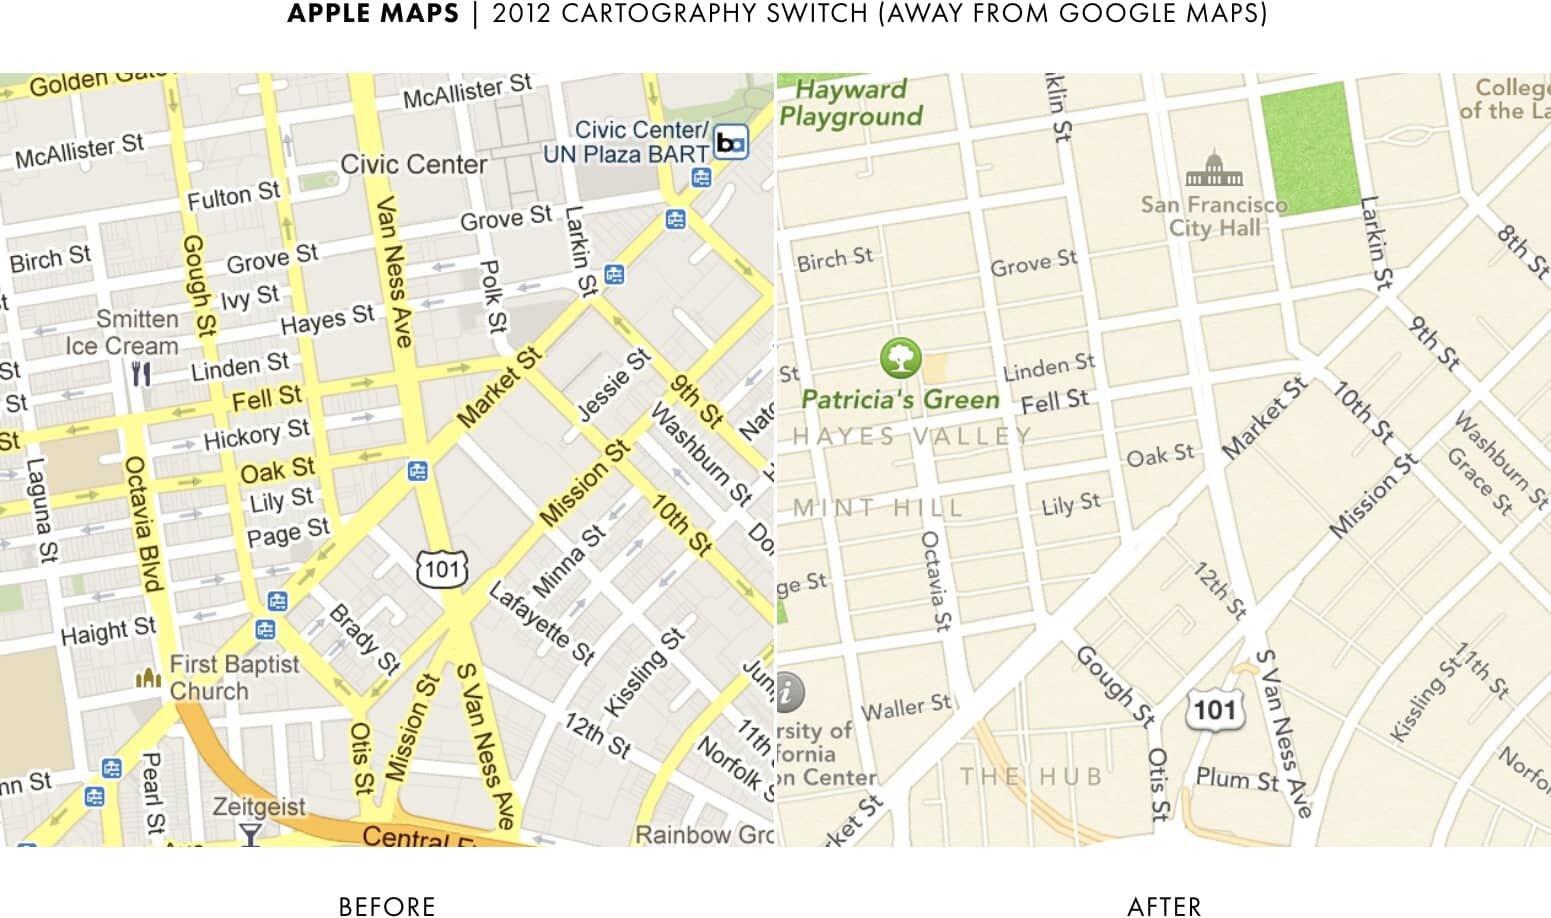 4 Cartography Change - Apple Maps 2012.jpg